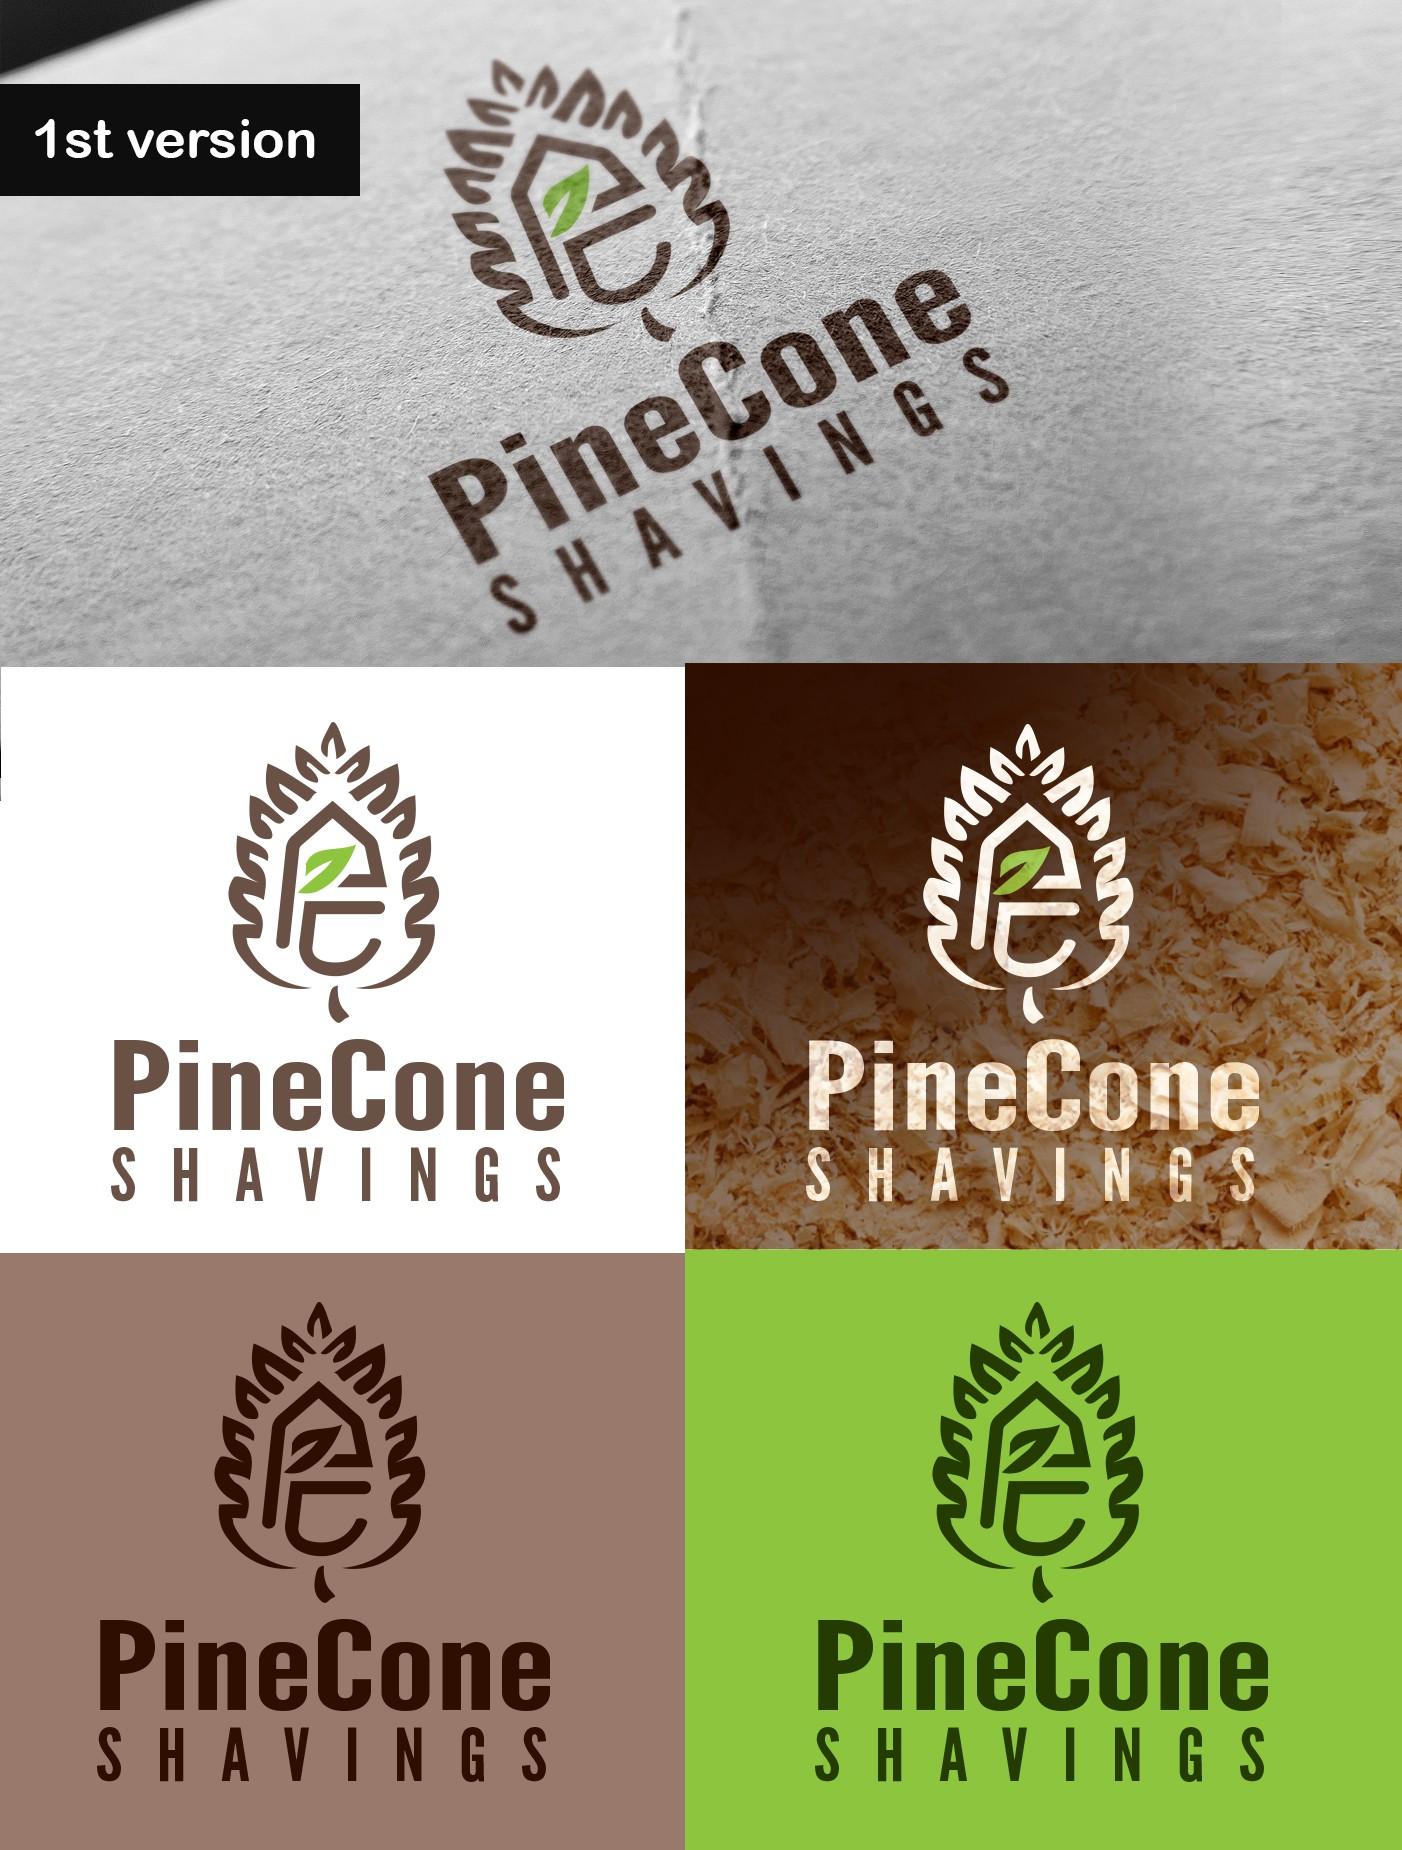 PineCone needs a powerful new logo